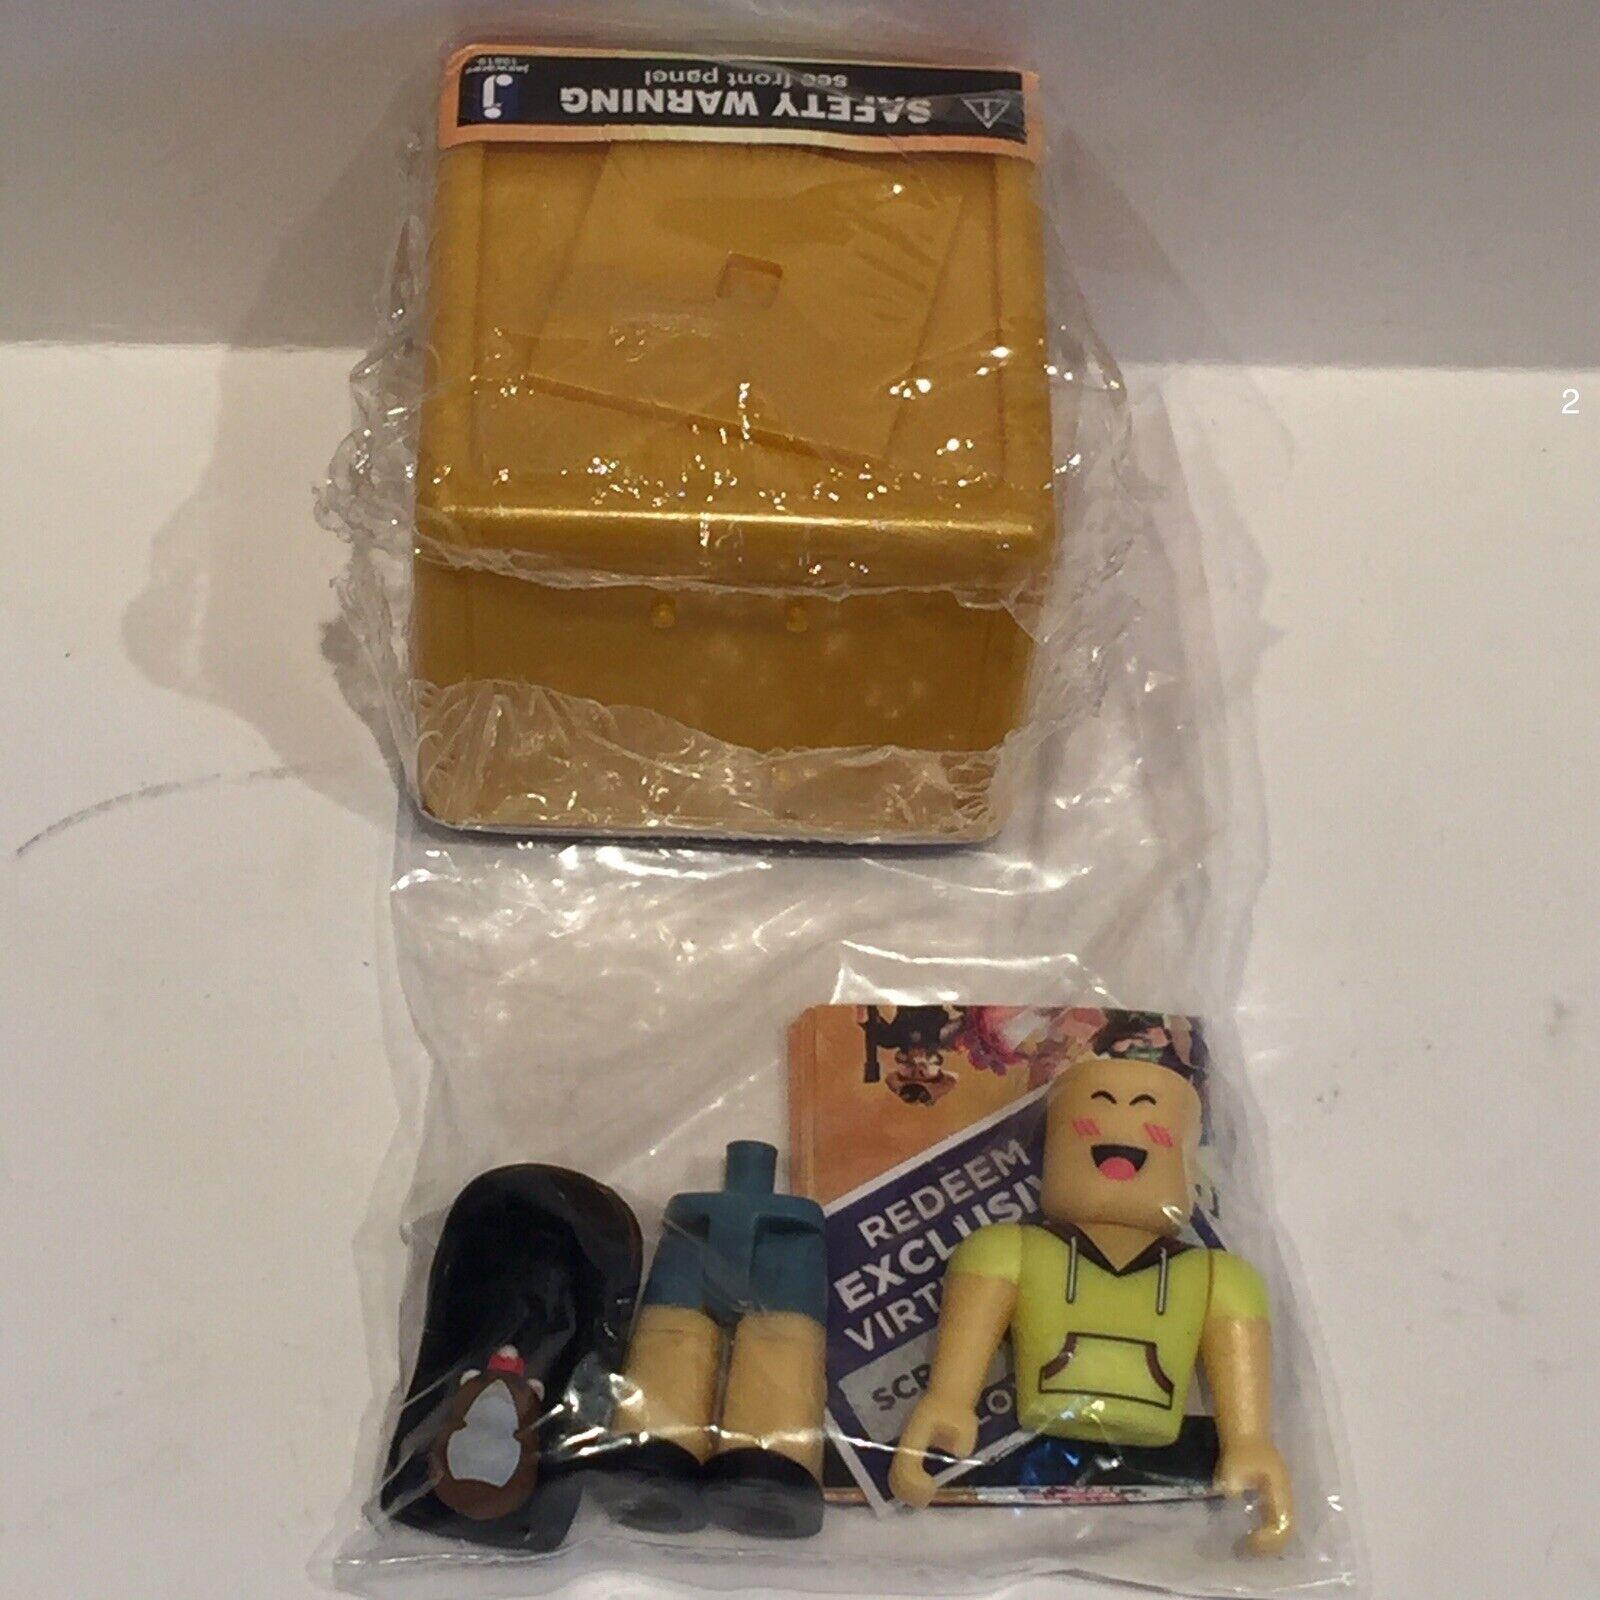 Roblox bambolaasticdreams Dreams Celebrity Series 1 oro Blind scatola cifra  Code